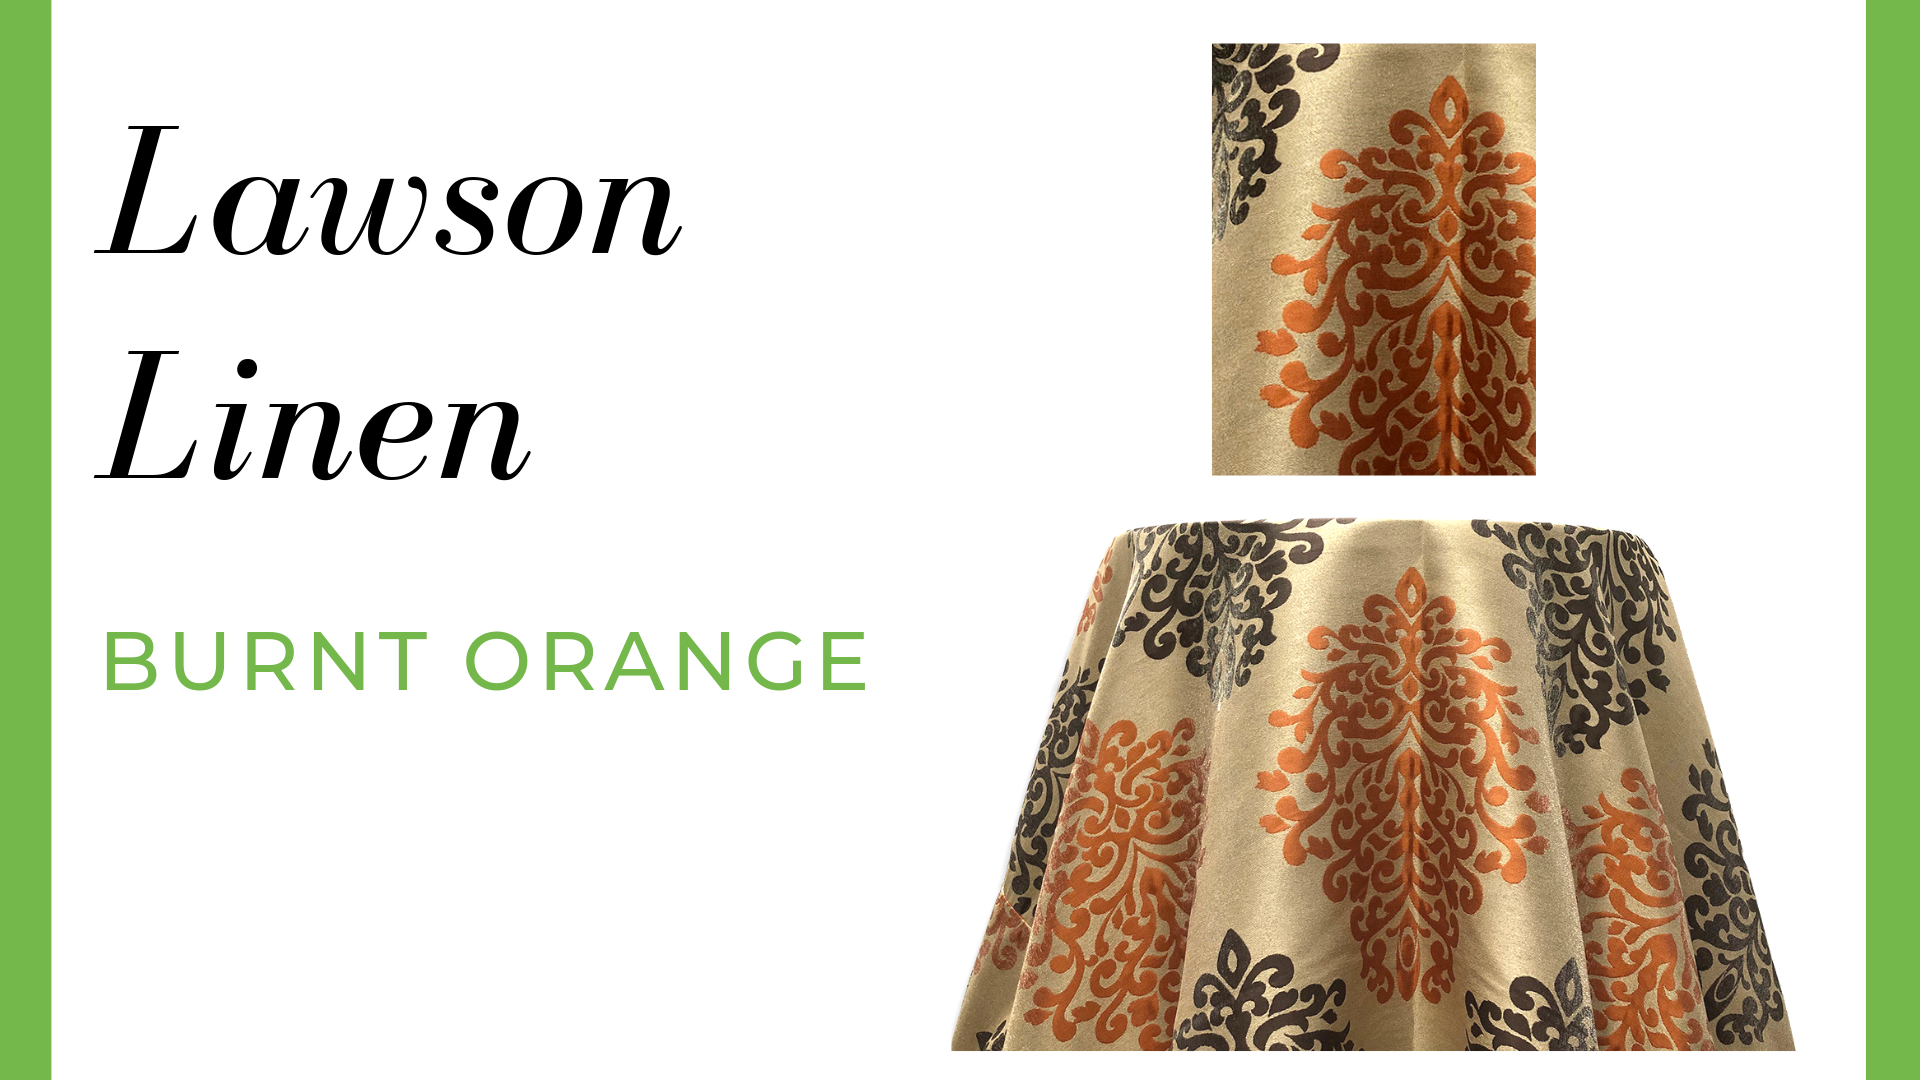 Lawson Linen - Burnt Orange